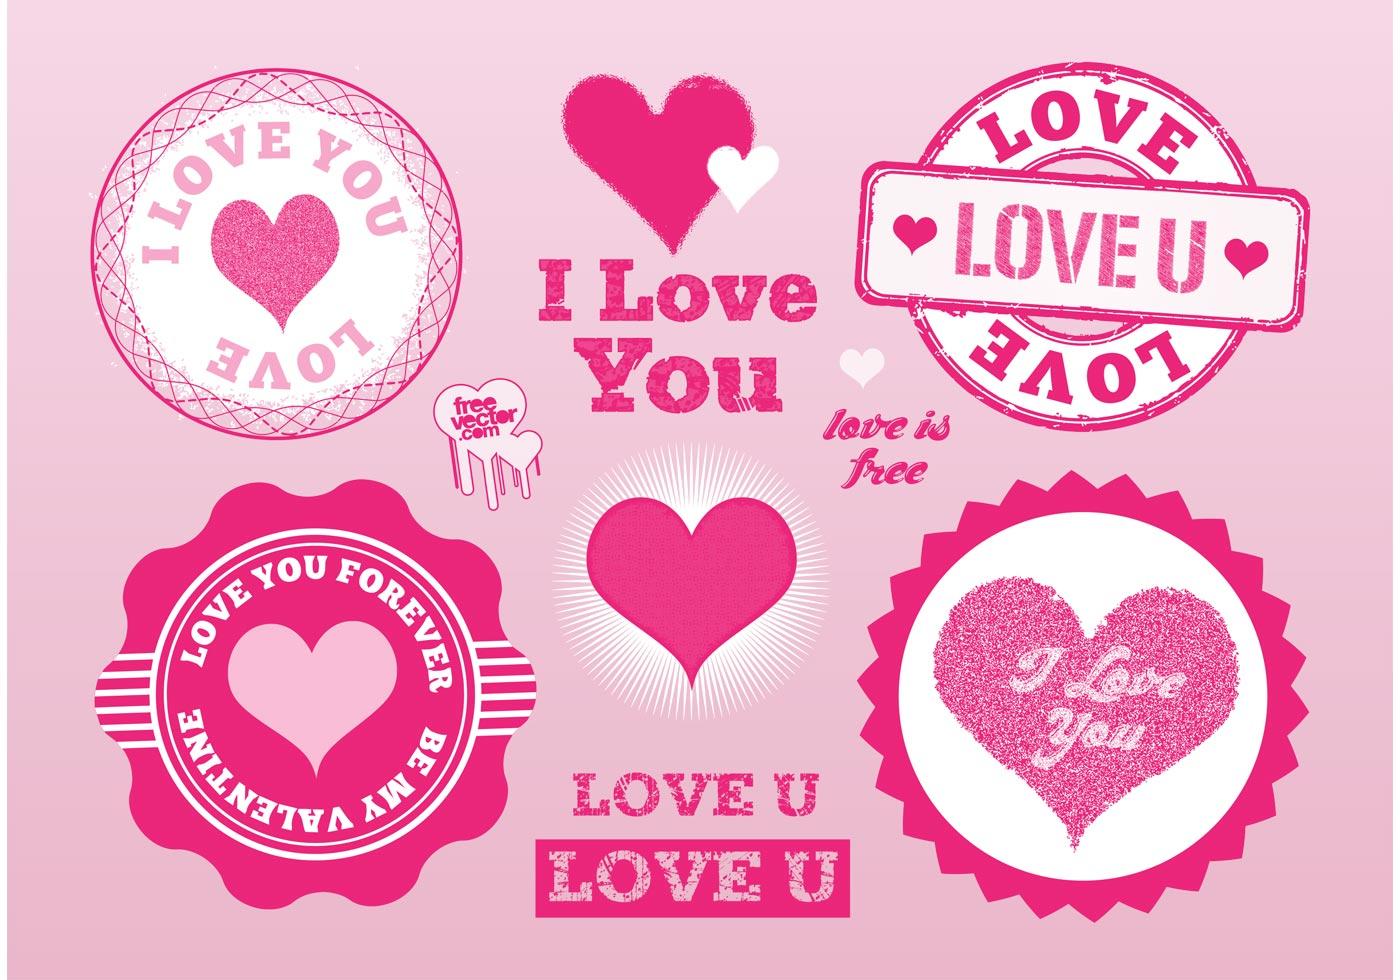 Love Stamps Vectors - Download Free Vector Art, Stock Graphics & Images